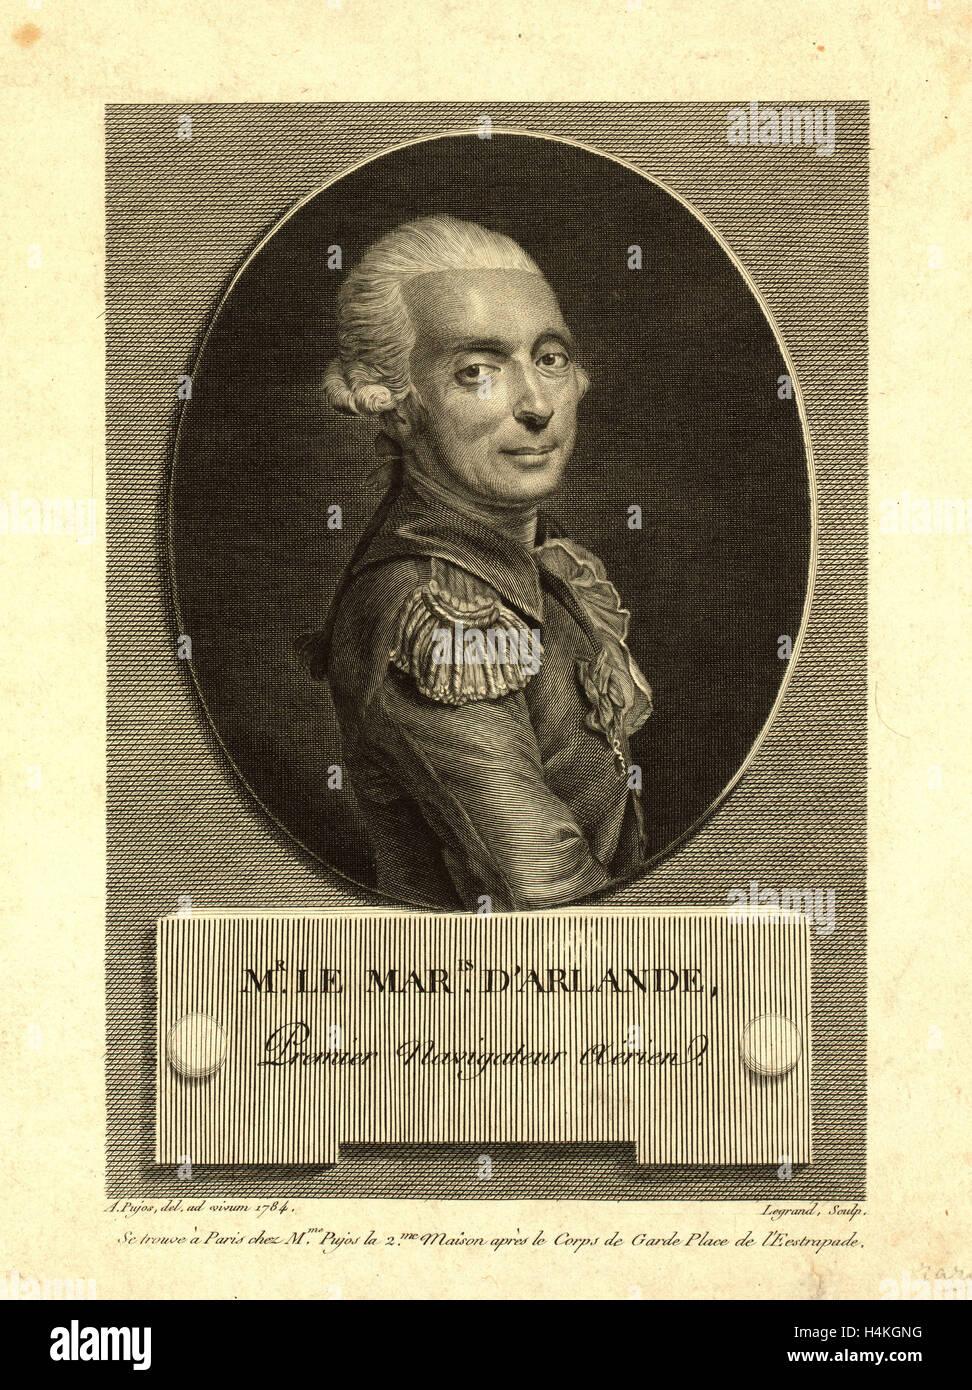 Mr. le maris. d'Arlande, first aerial navigator,  Pujos, André, 1738-1788, artist, Half-length portrait - Stock Image